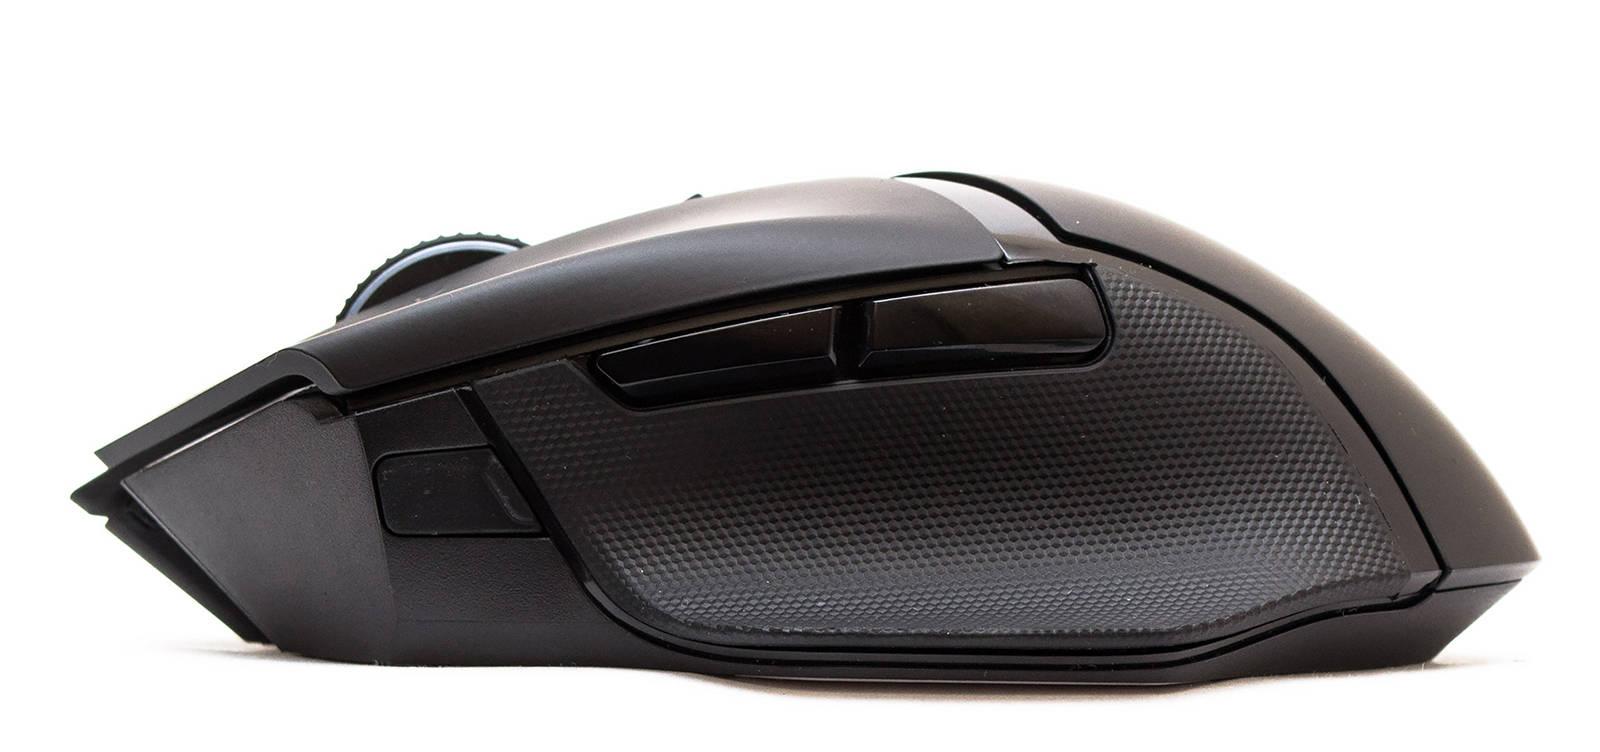 Мышь Razer Basilisk Ultimate. Фото 7